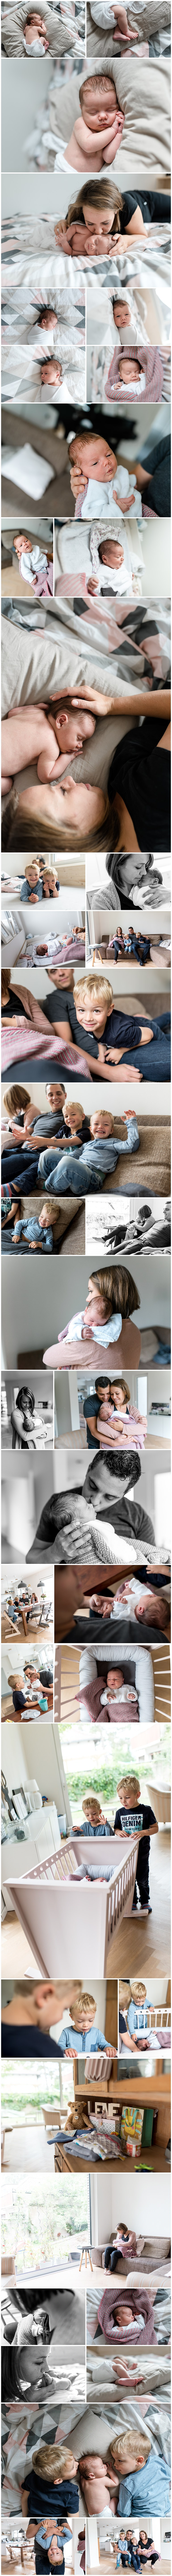 Neugeborenenbilder zuhause Homestory Karlsruhe